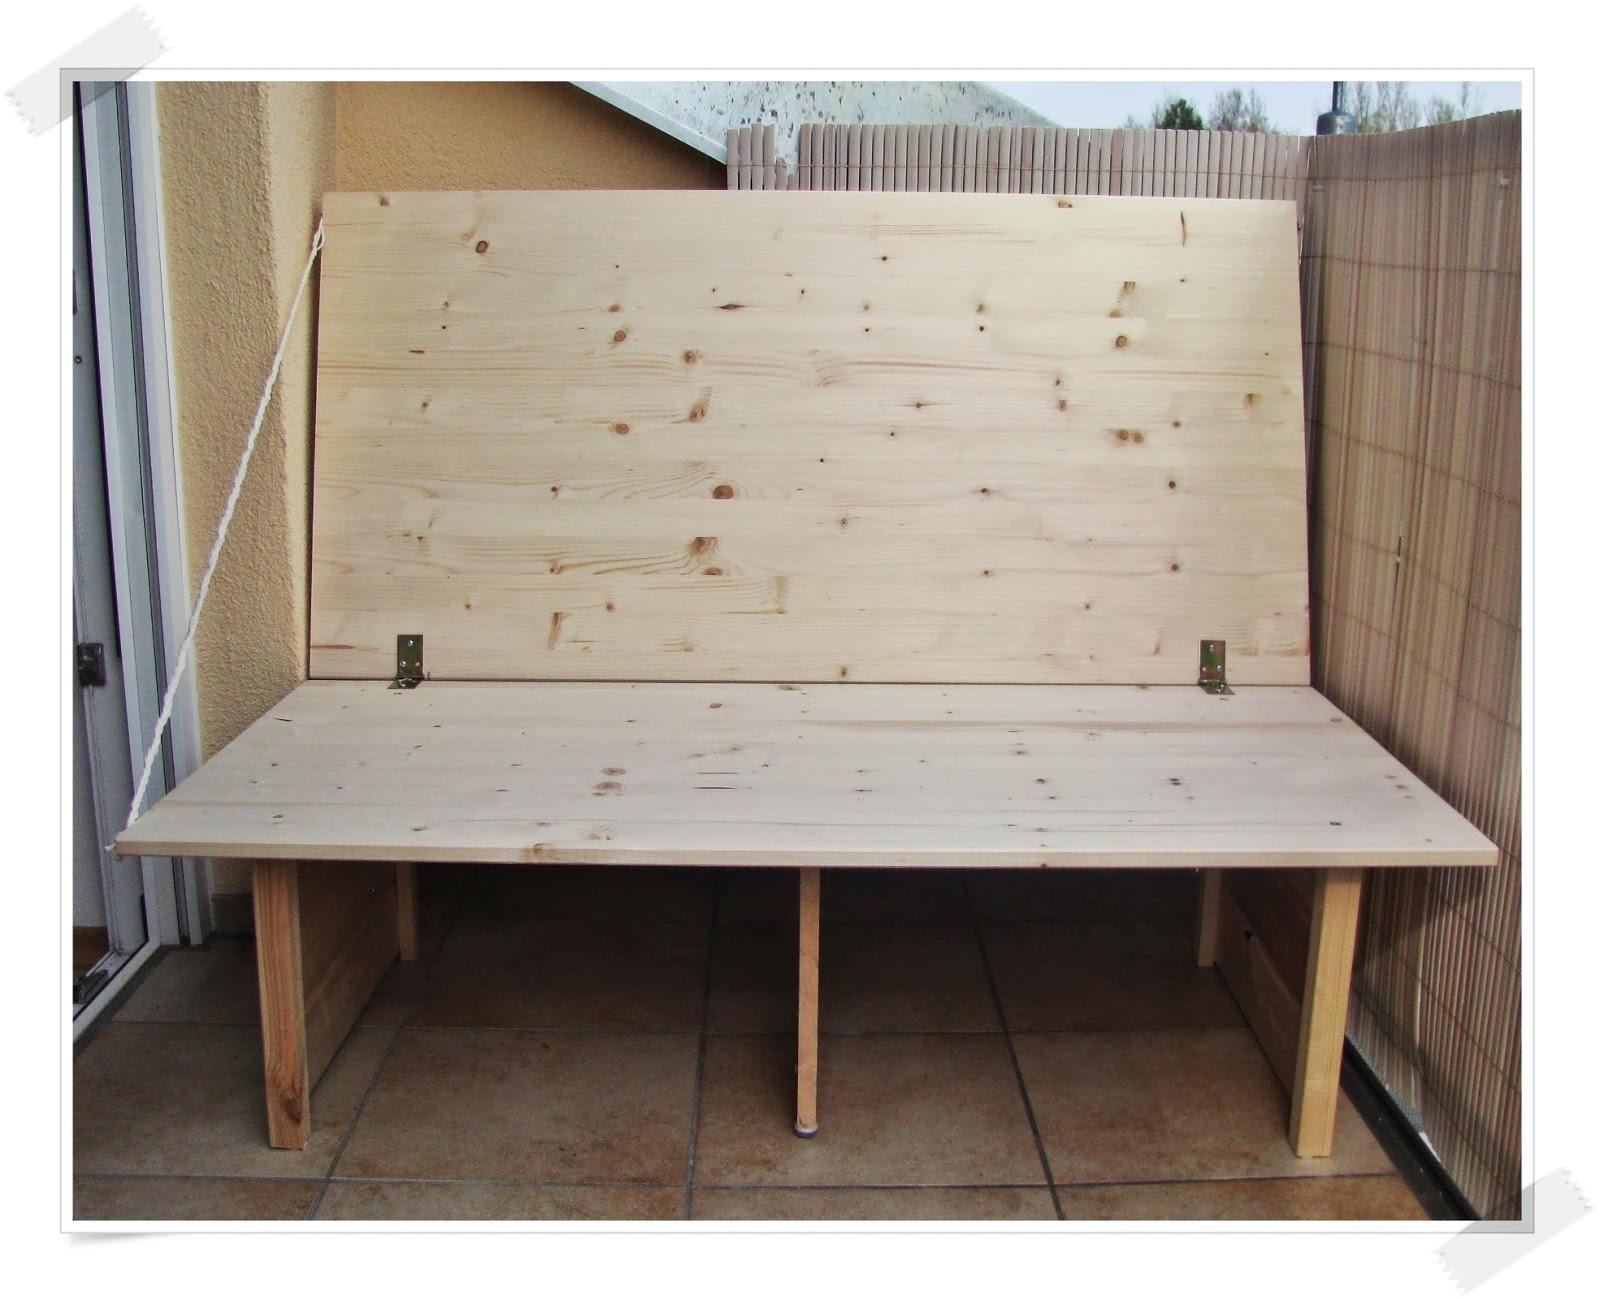 liebste schwester diy chilloutpl tzchen f r den balkon. Black Bedroom Furniture Sets. Home Design Ideas